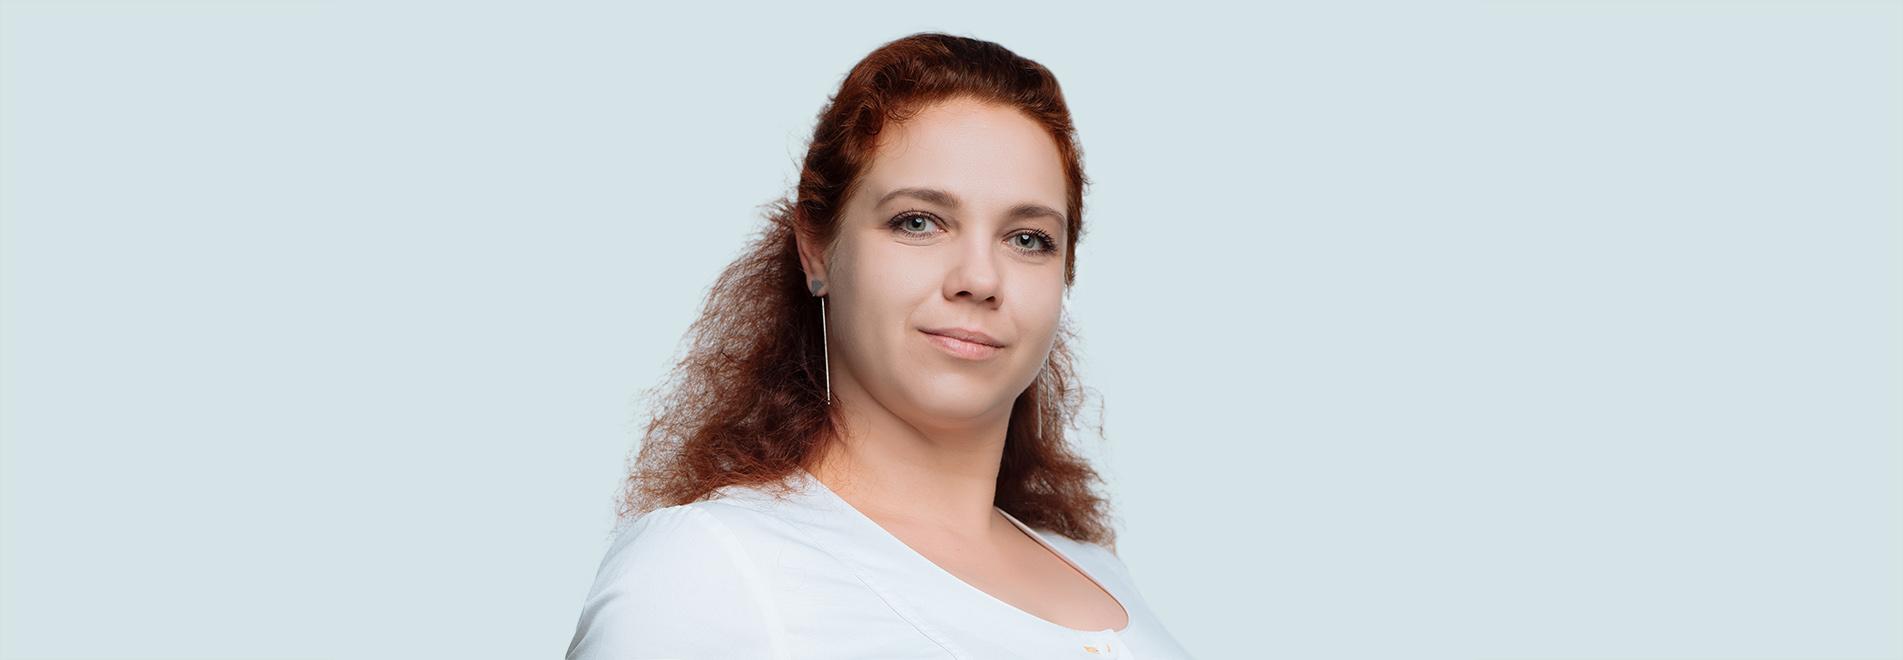 врач-анестезиолог клиники «Medical Plaza» (г.Днипро) Юлия Жадан